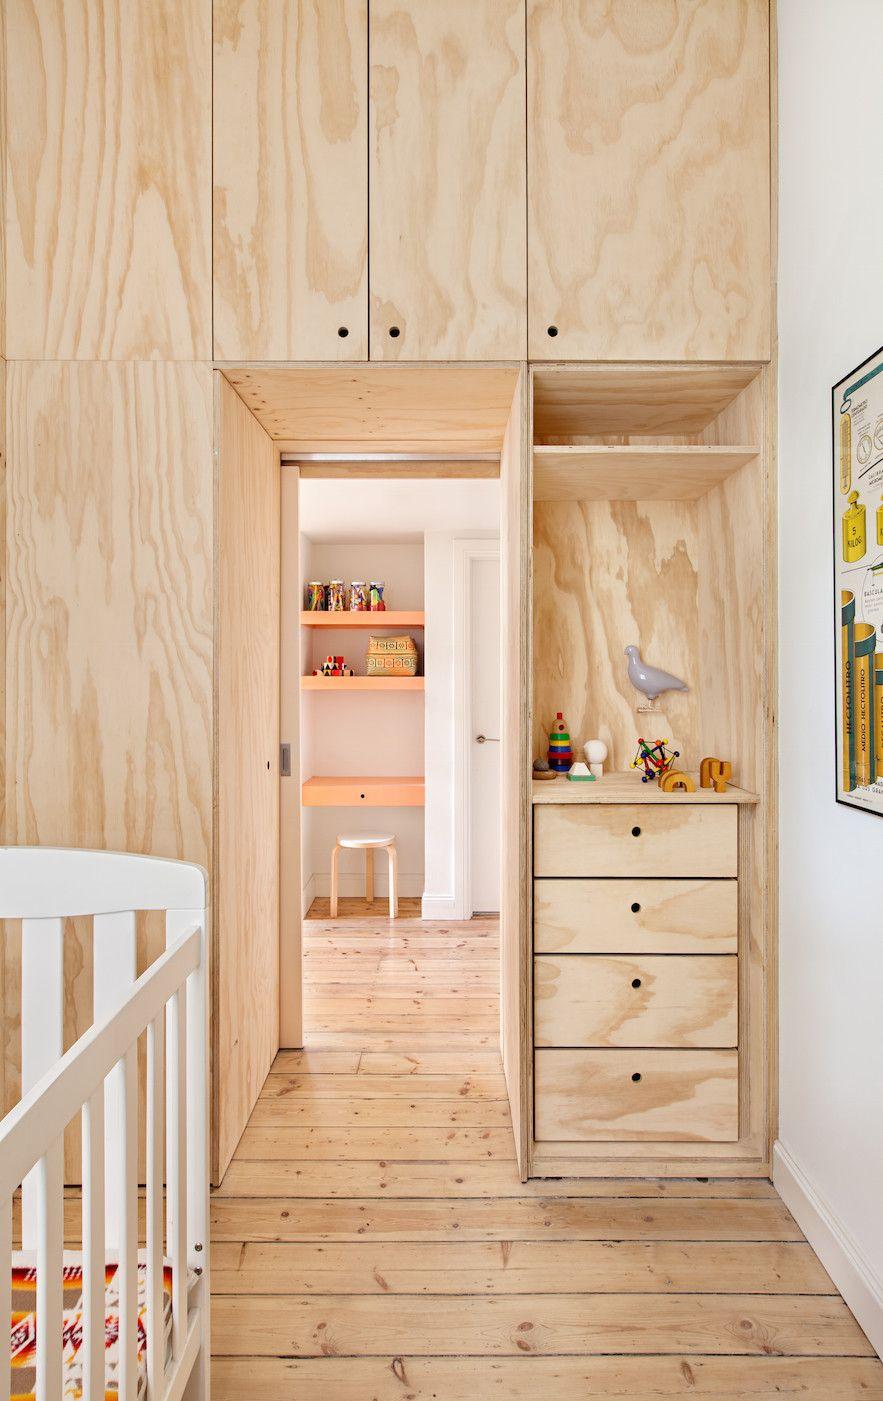 Japaneseinspired microbedroom plywood interior